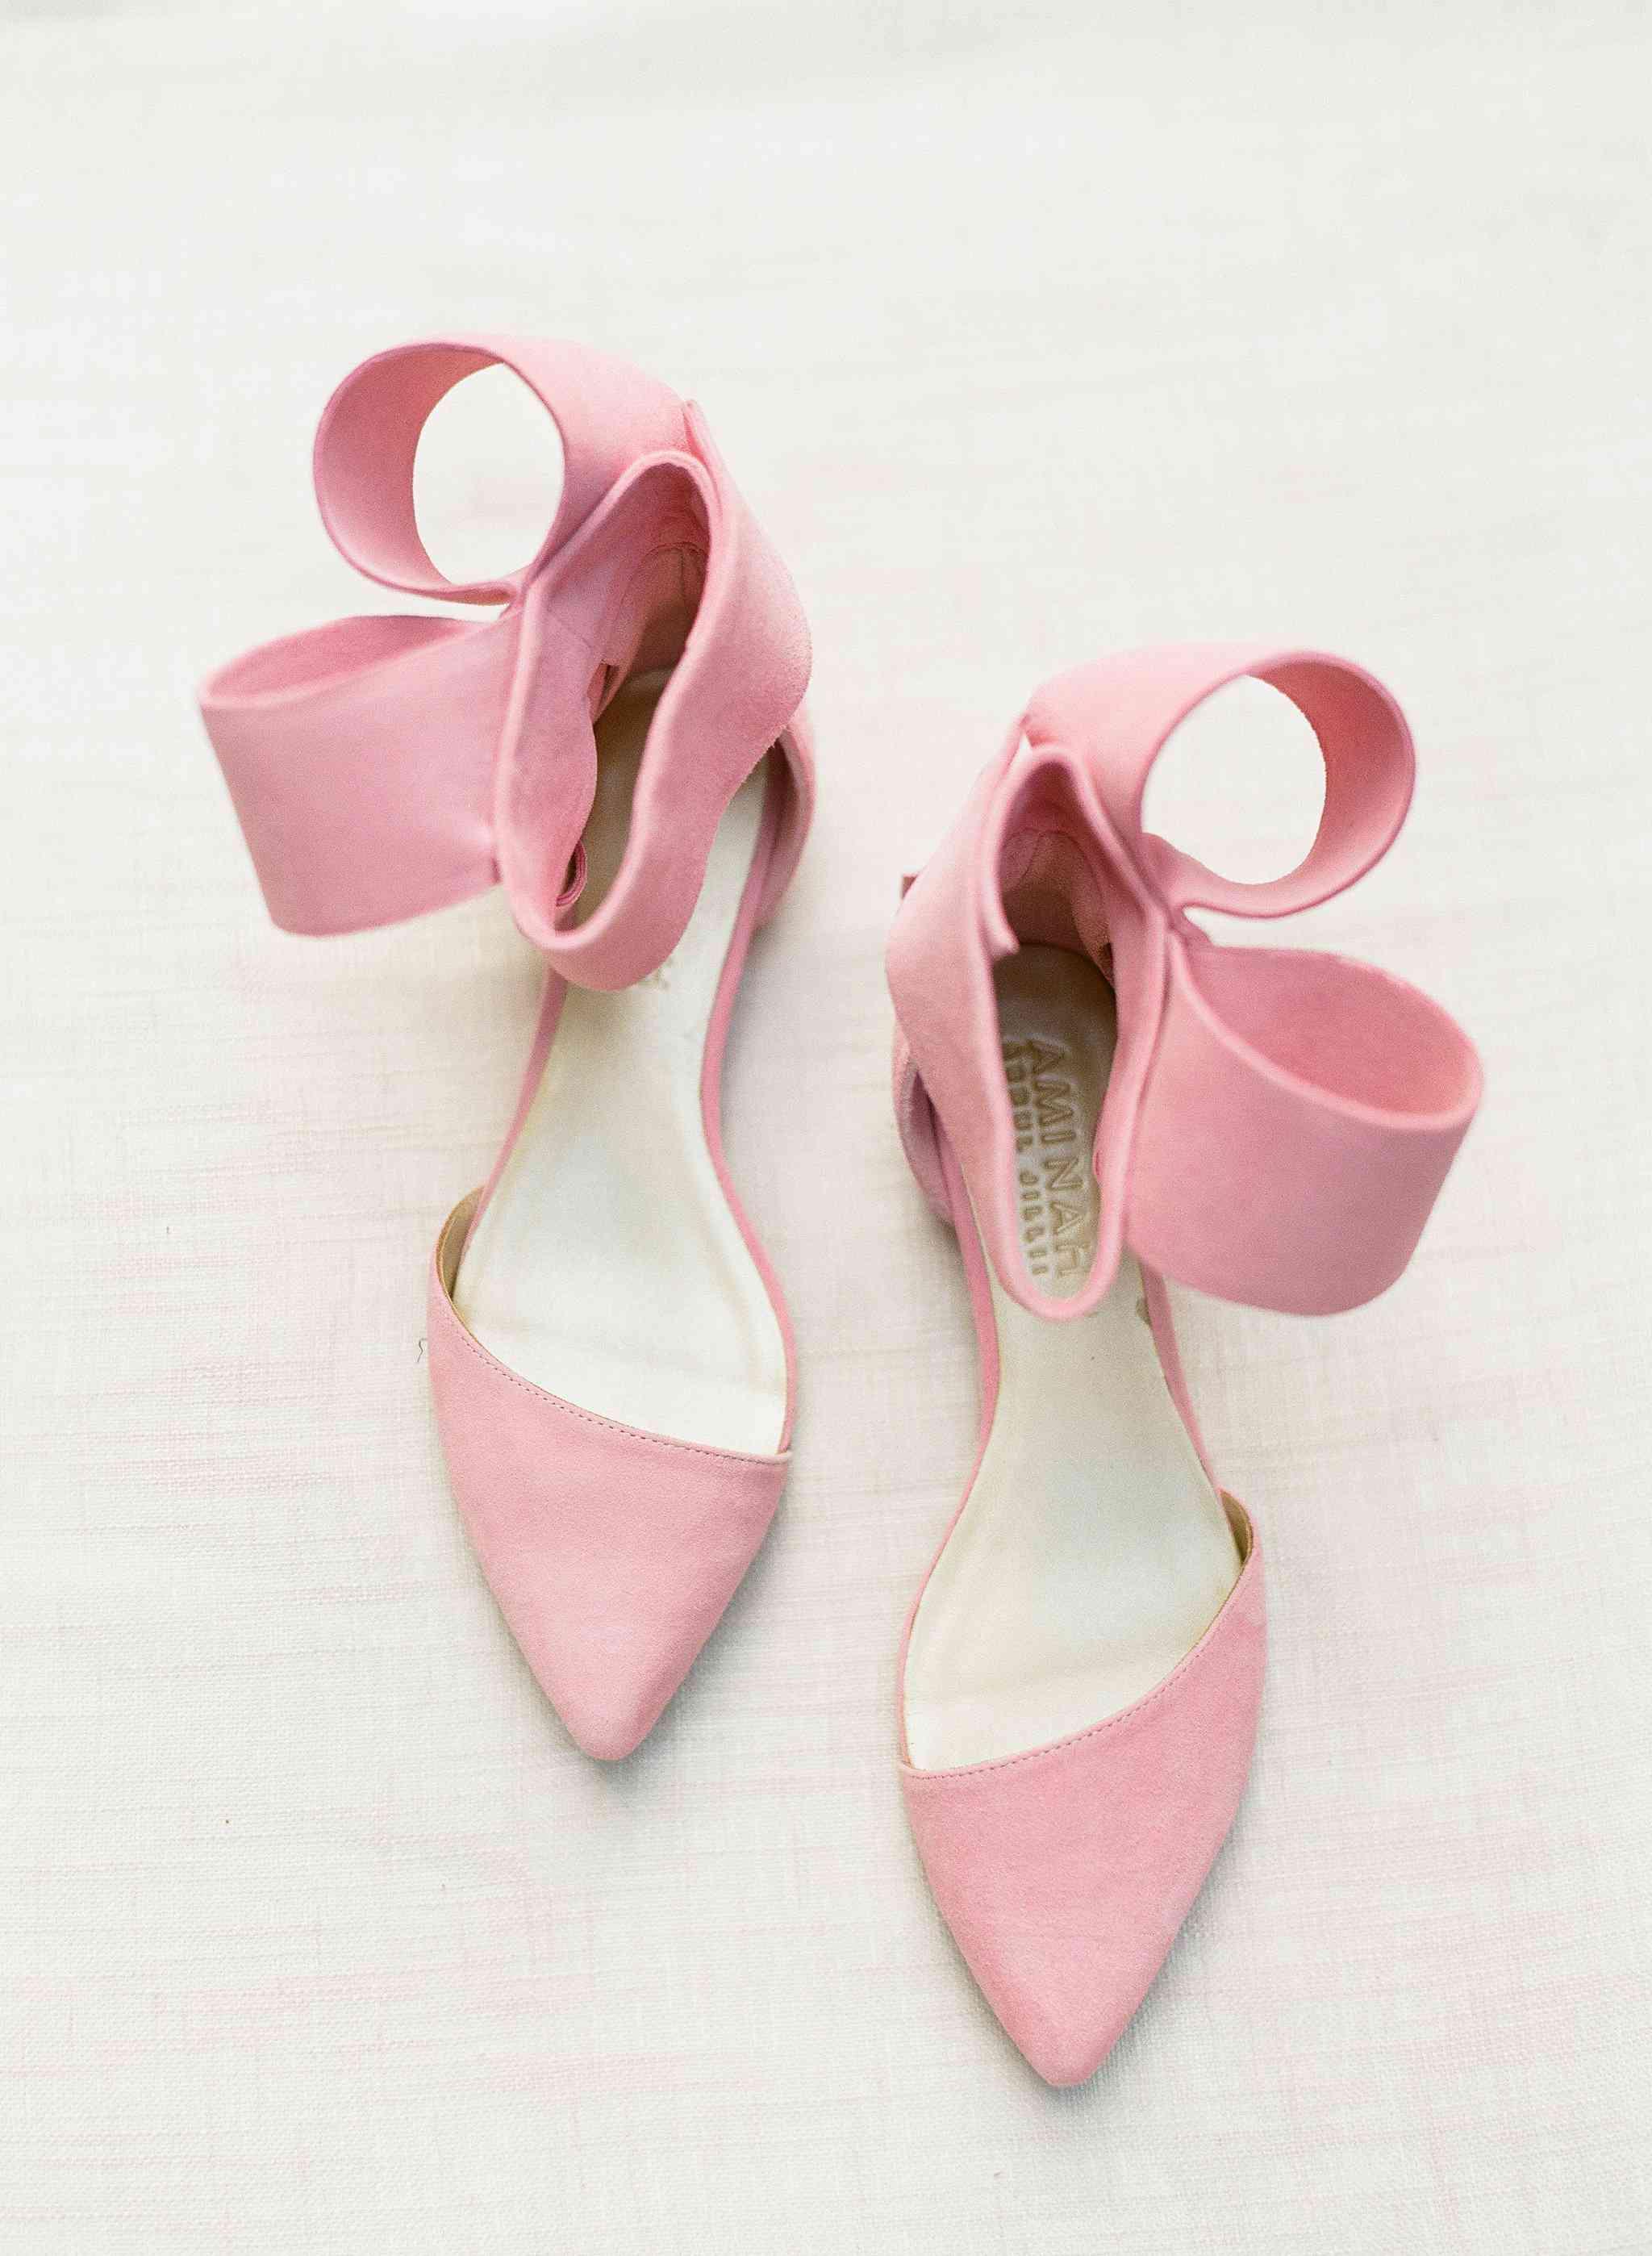 Pink Aminah Abdul Jillil Shoes